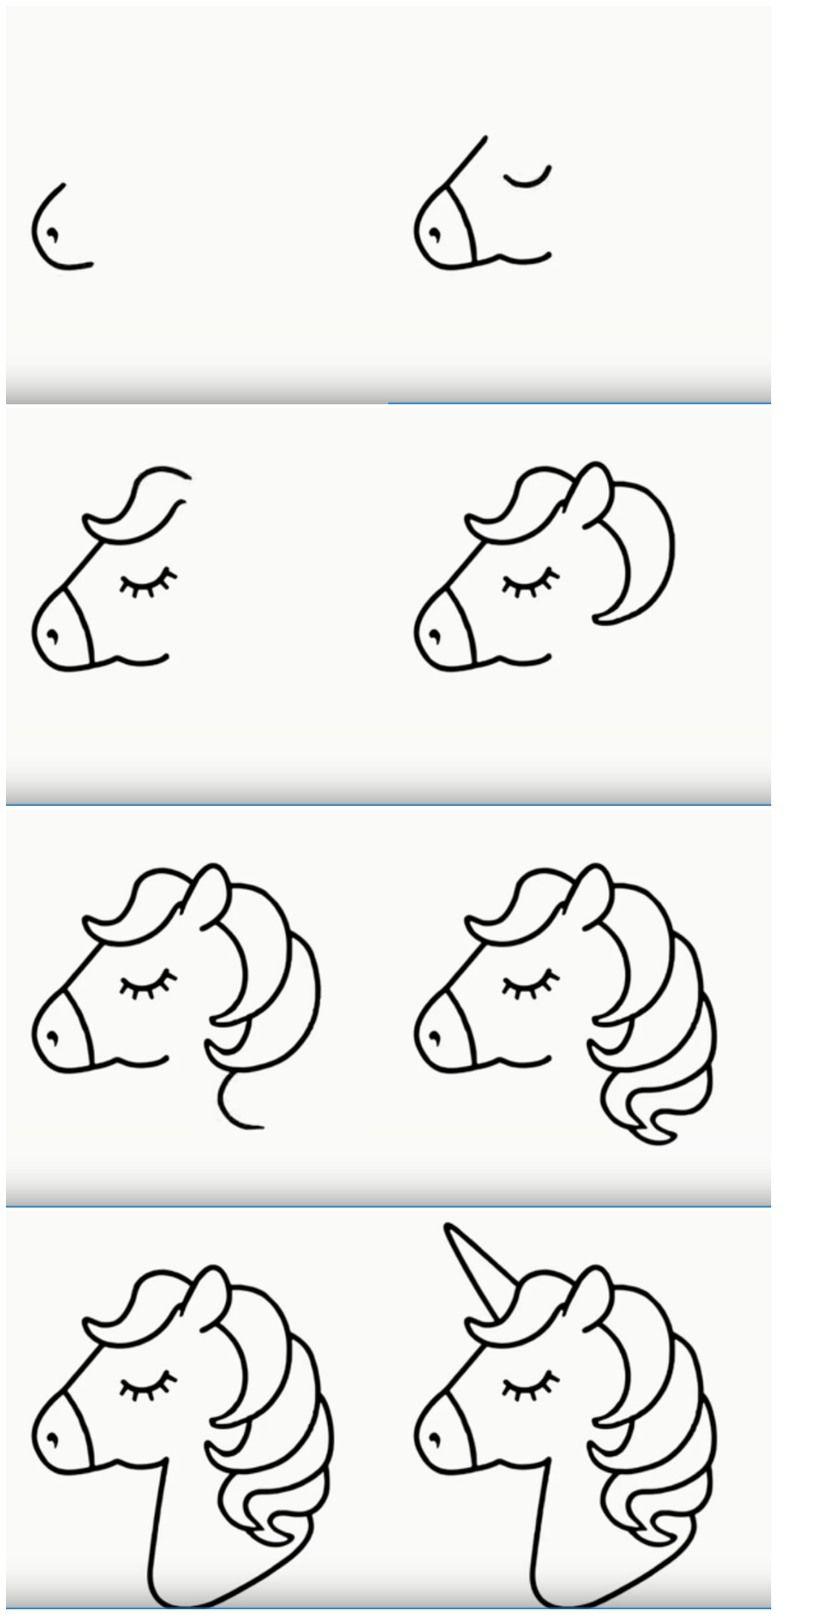 Dibuja Hermosos Unicornios Paso A Paso Guias A Lapiz Para Ninos Muy Faciles Alas Como Dibujar Un Unicornio Dibujos Sencillos Para Ninos Dibujos Faciles